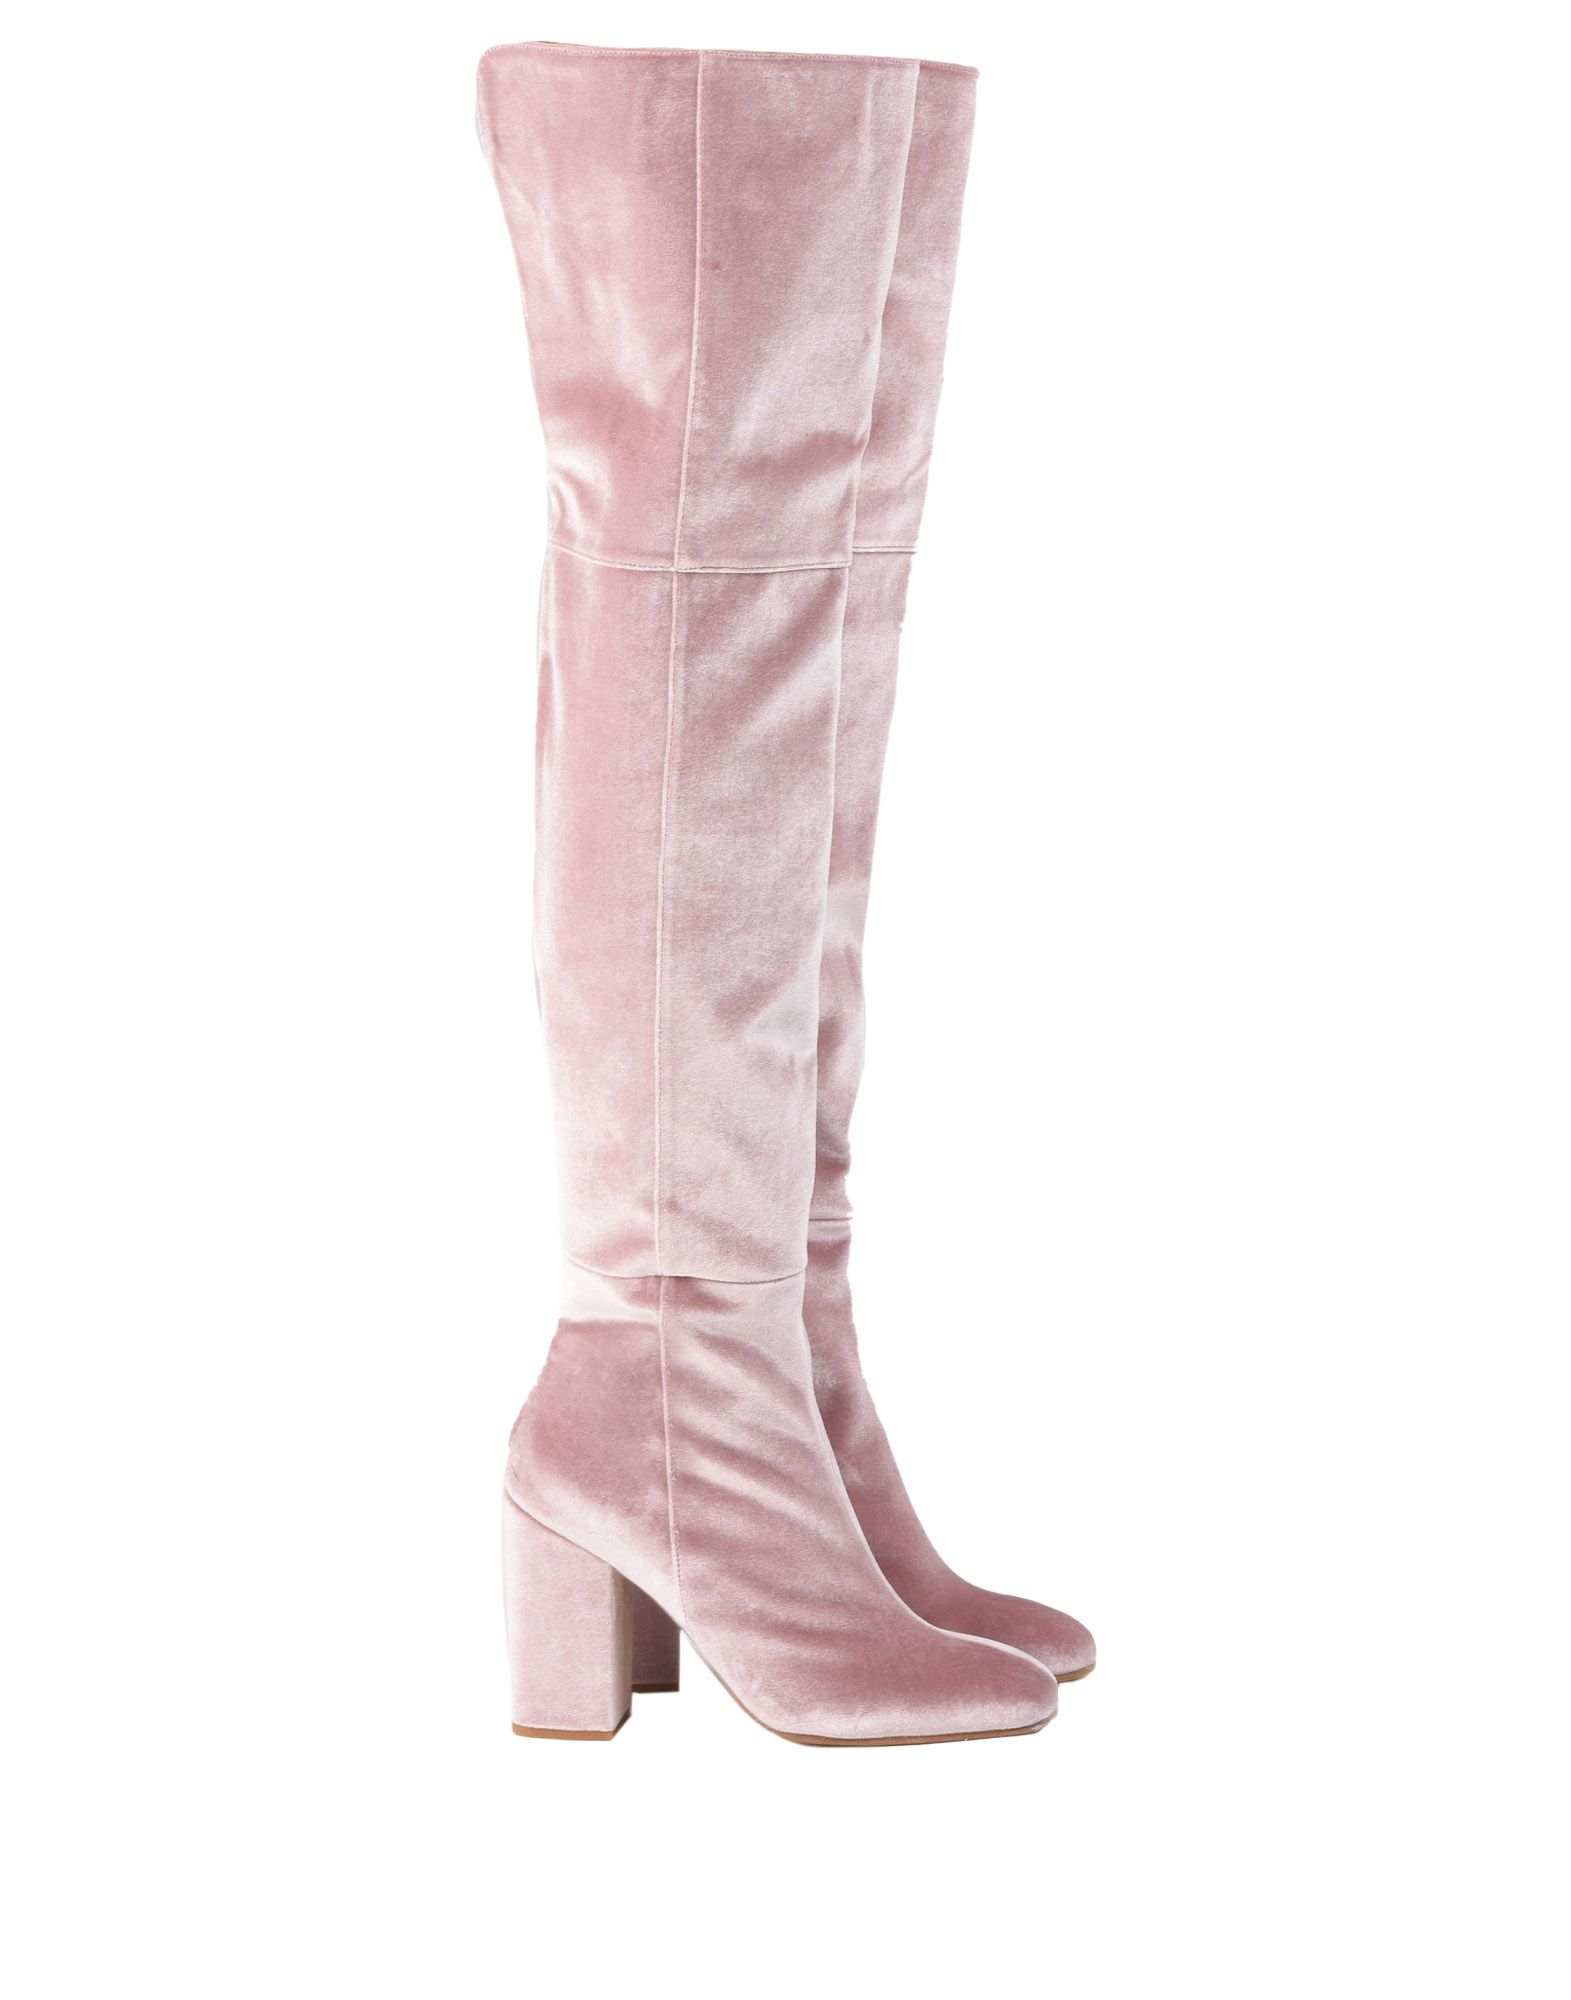 8 Stiefel Schuhe Damen  11339688RH Heiße Schuhe Stiefel 57ec3d